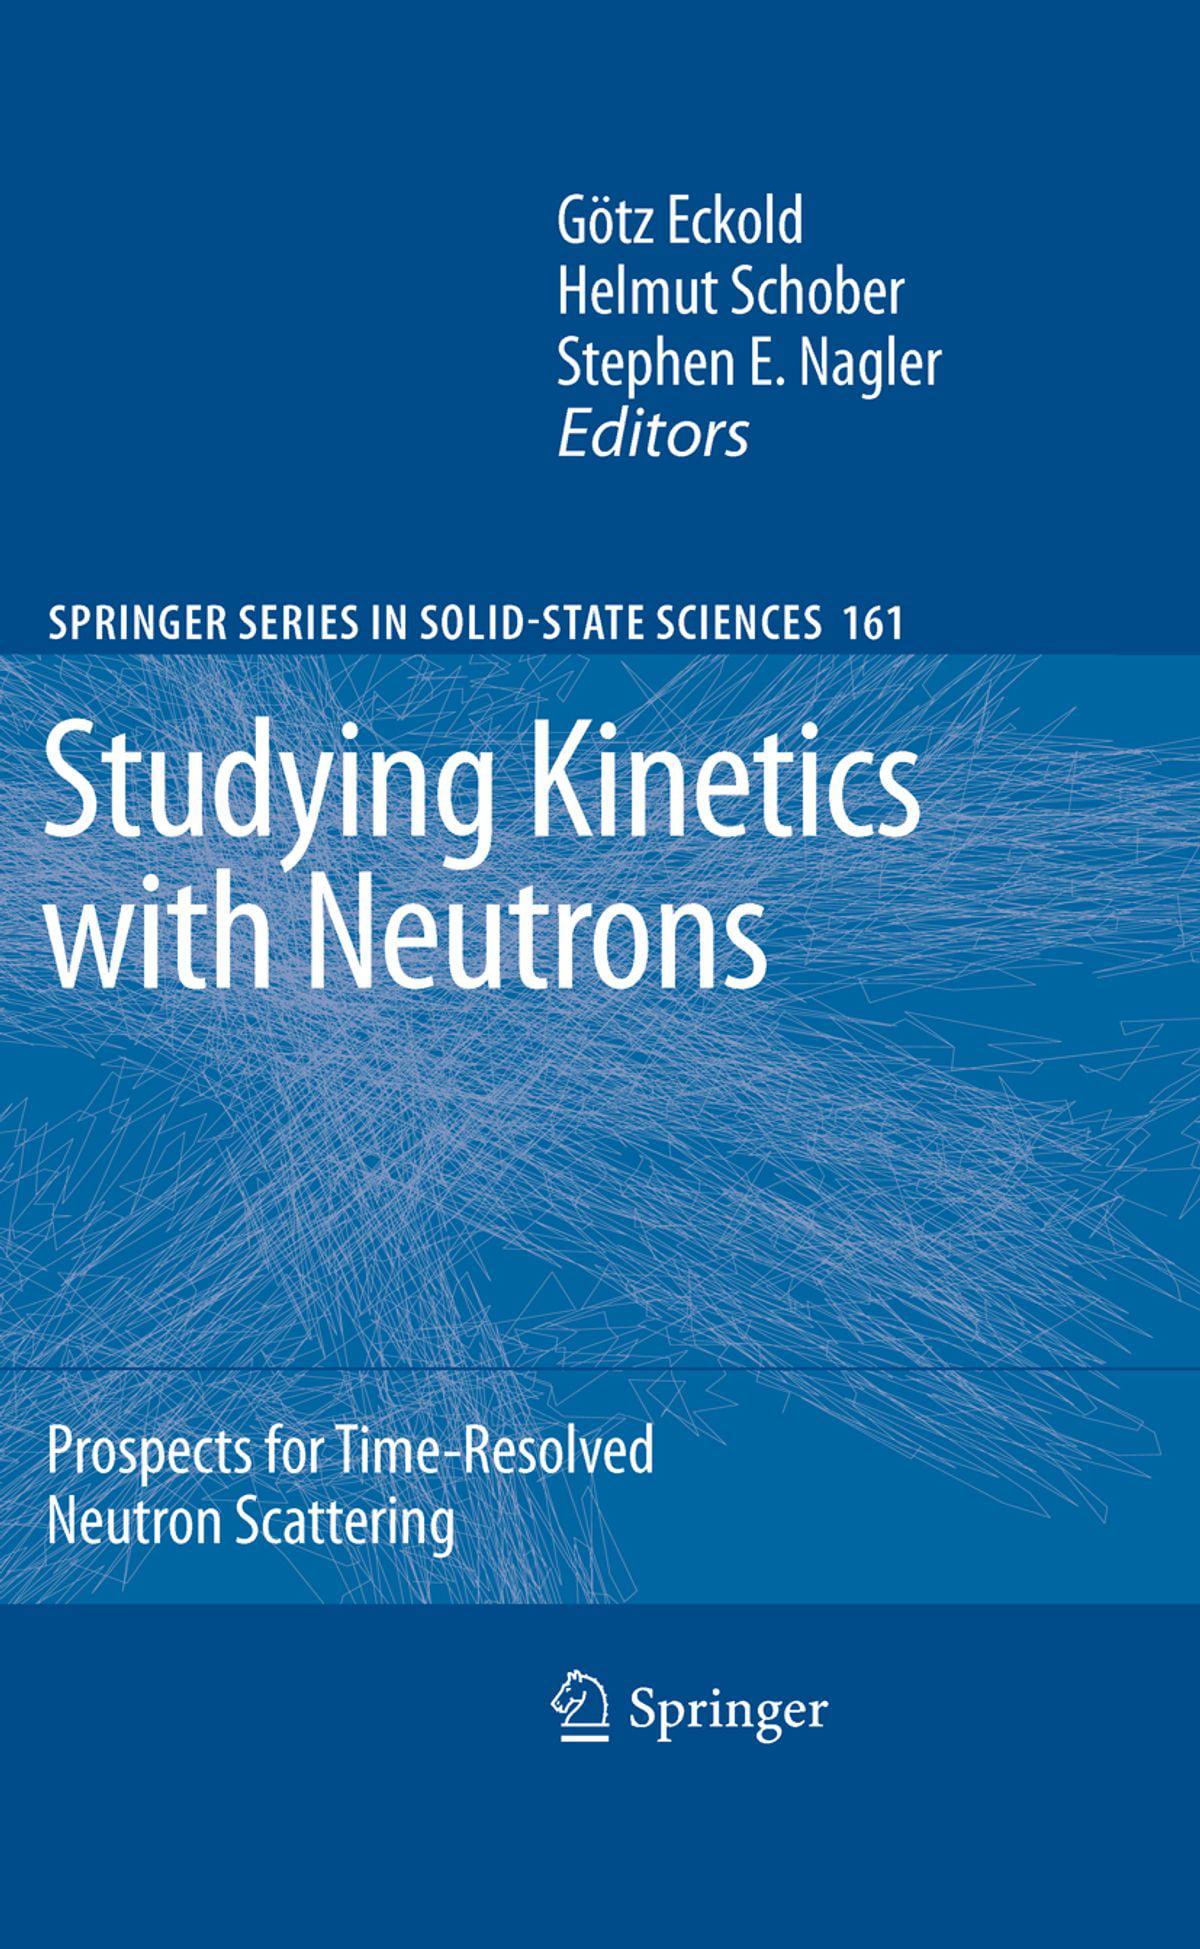 STUDYING KINETICS WITH NEUTRONS - Gotz Eckold